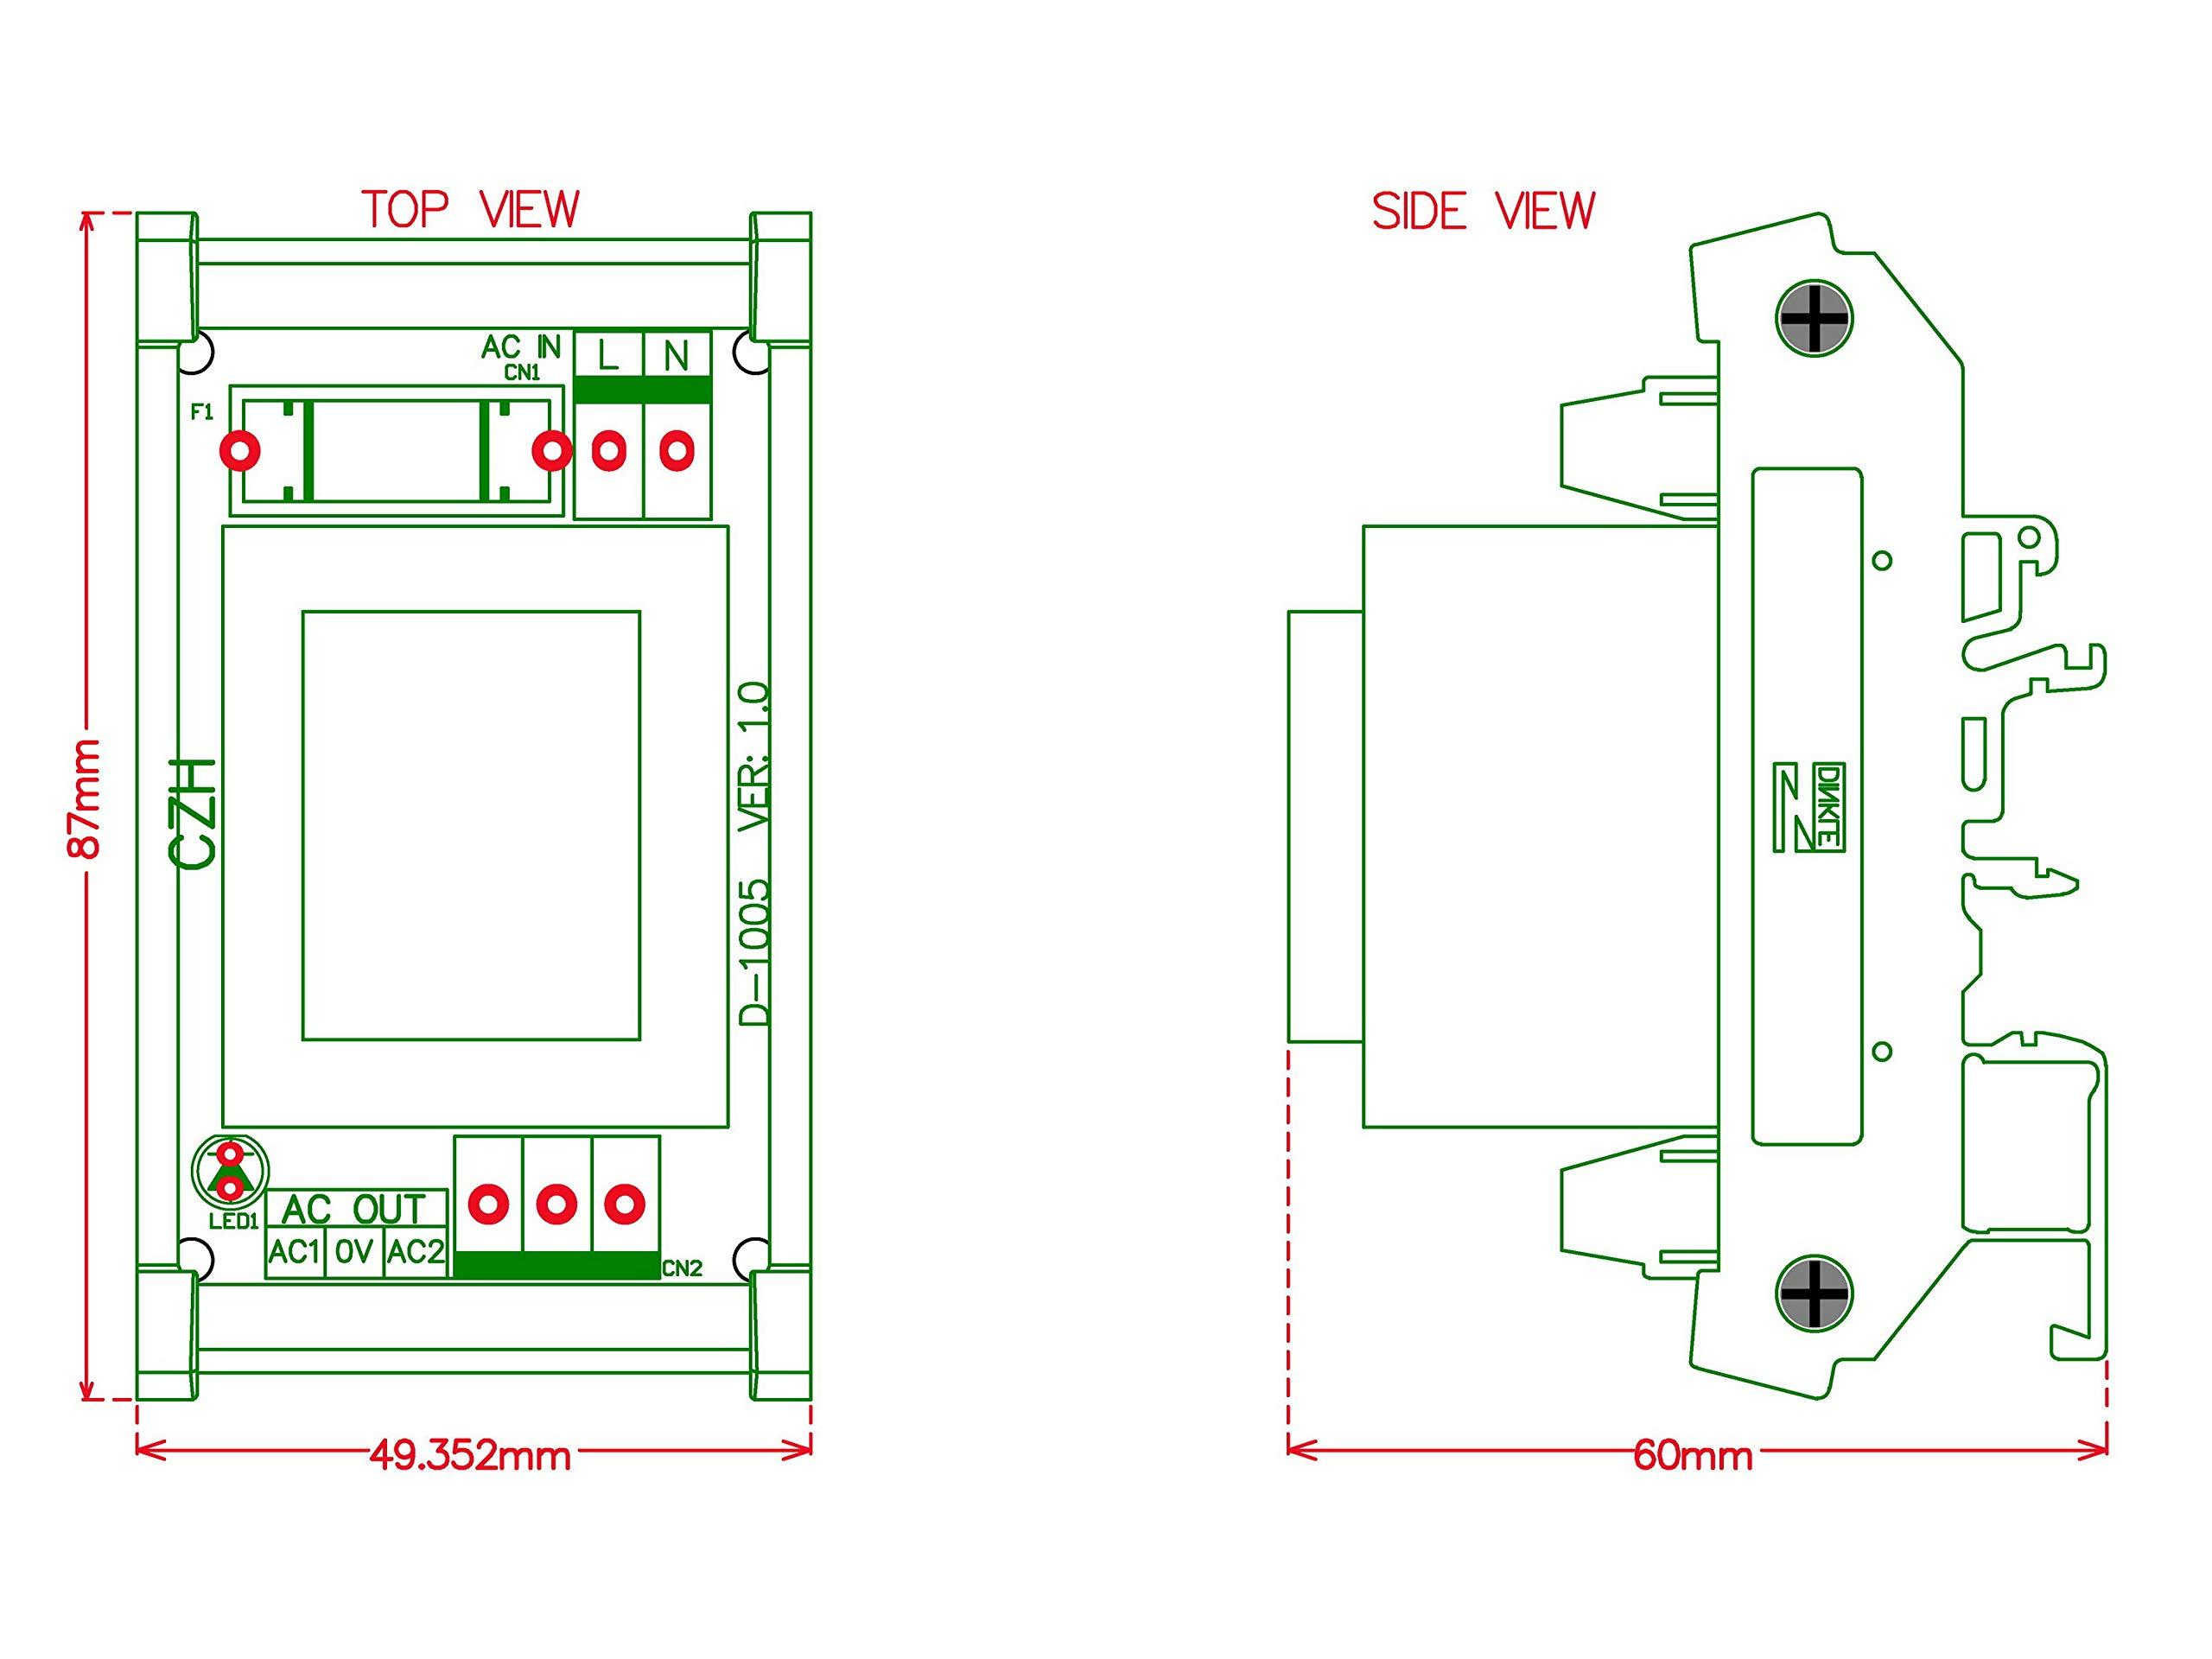 Electronics-Salon in AC115V Out AC24V 5 Watt(VA) DIN Rail Mount Power Transformer Module, 24Vac.